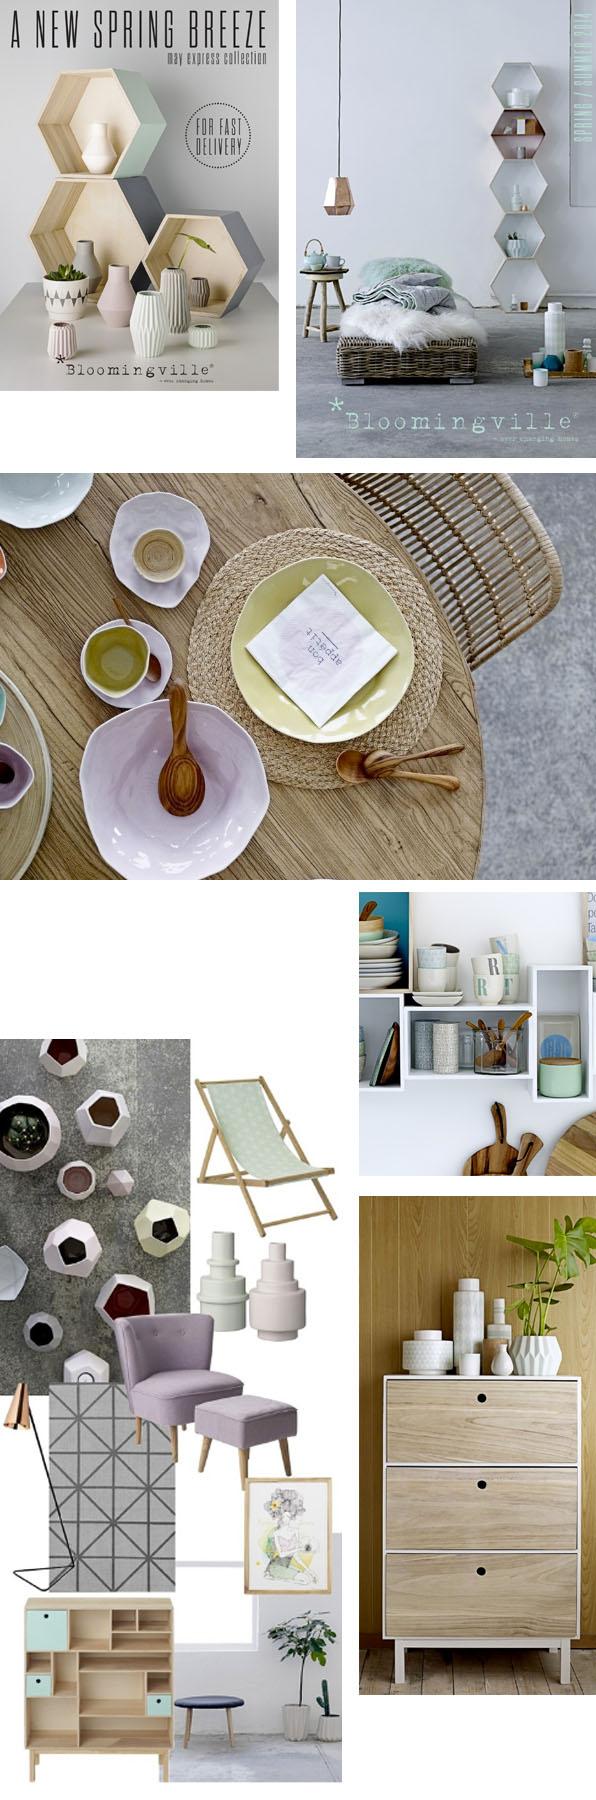 02 diseño nordico nordicdesign de © bloomingville en modus-vivendi